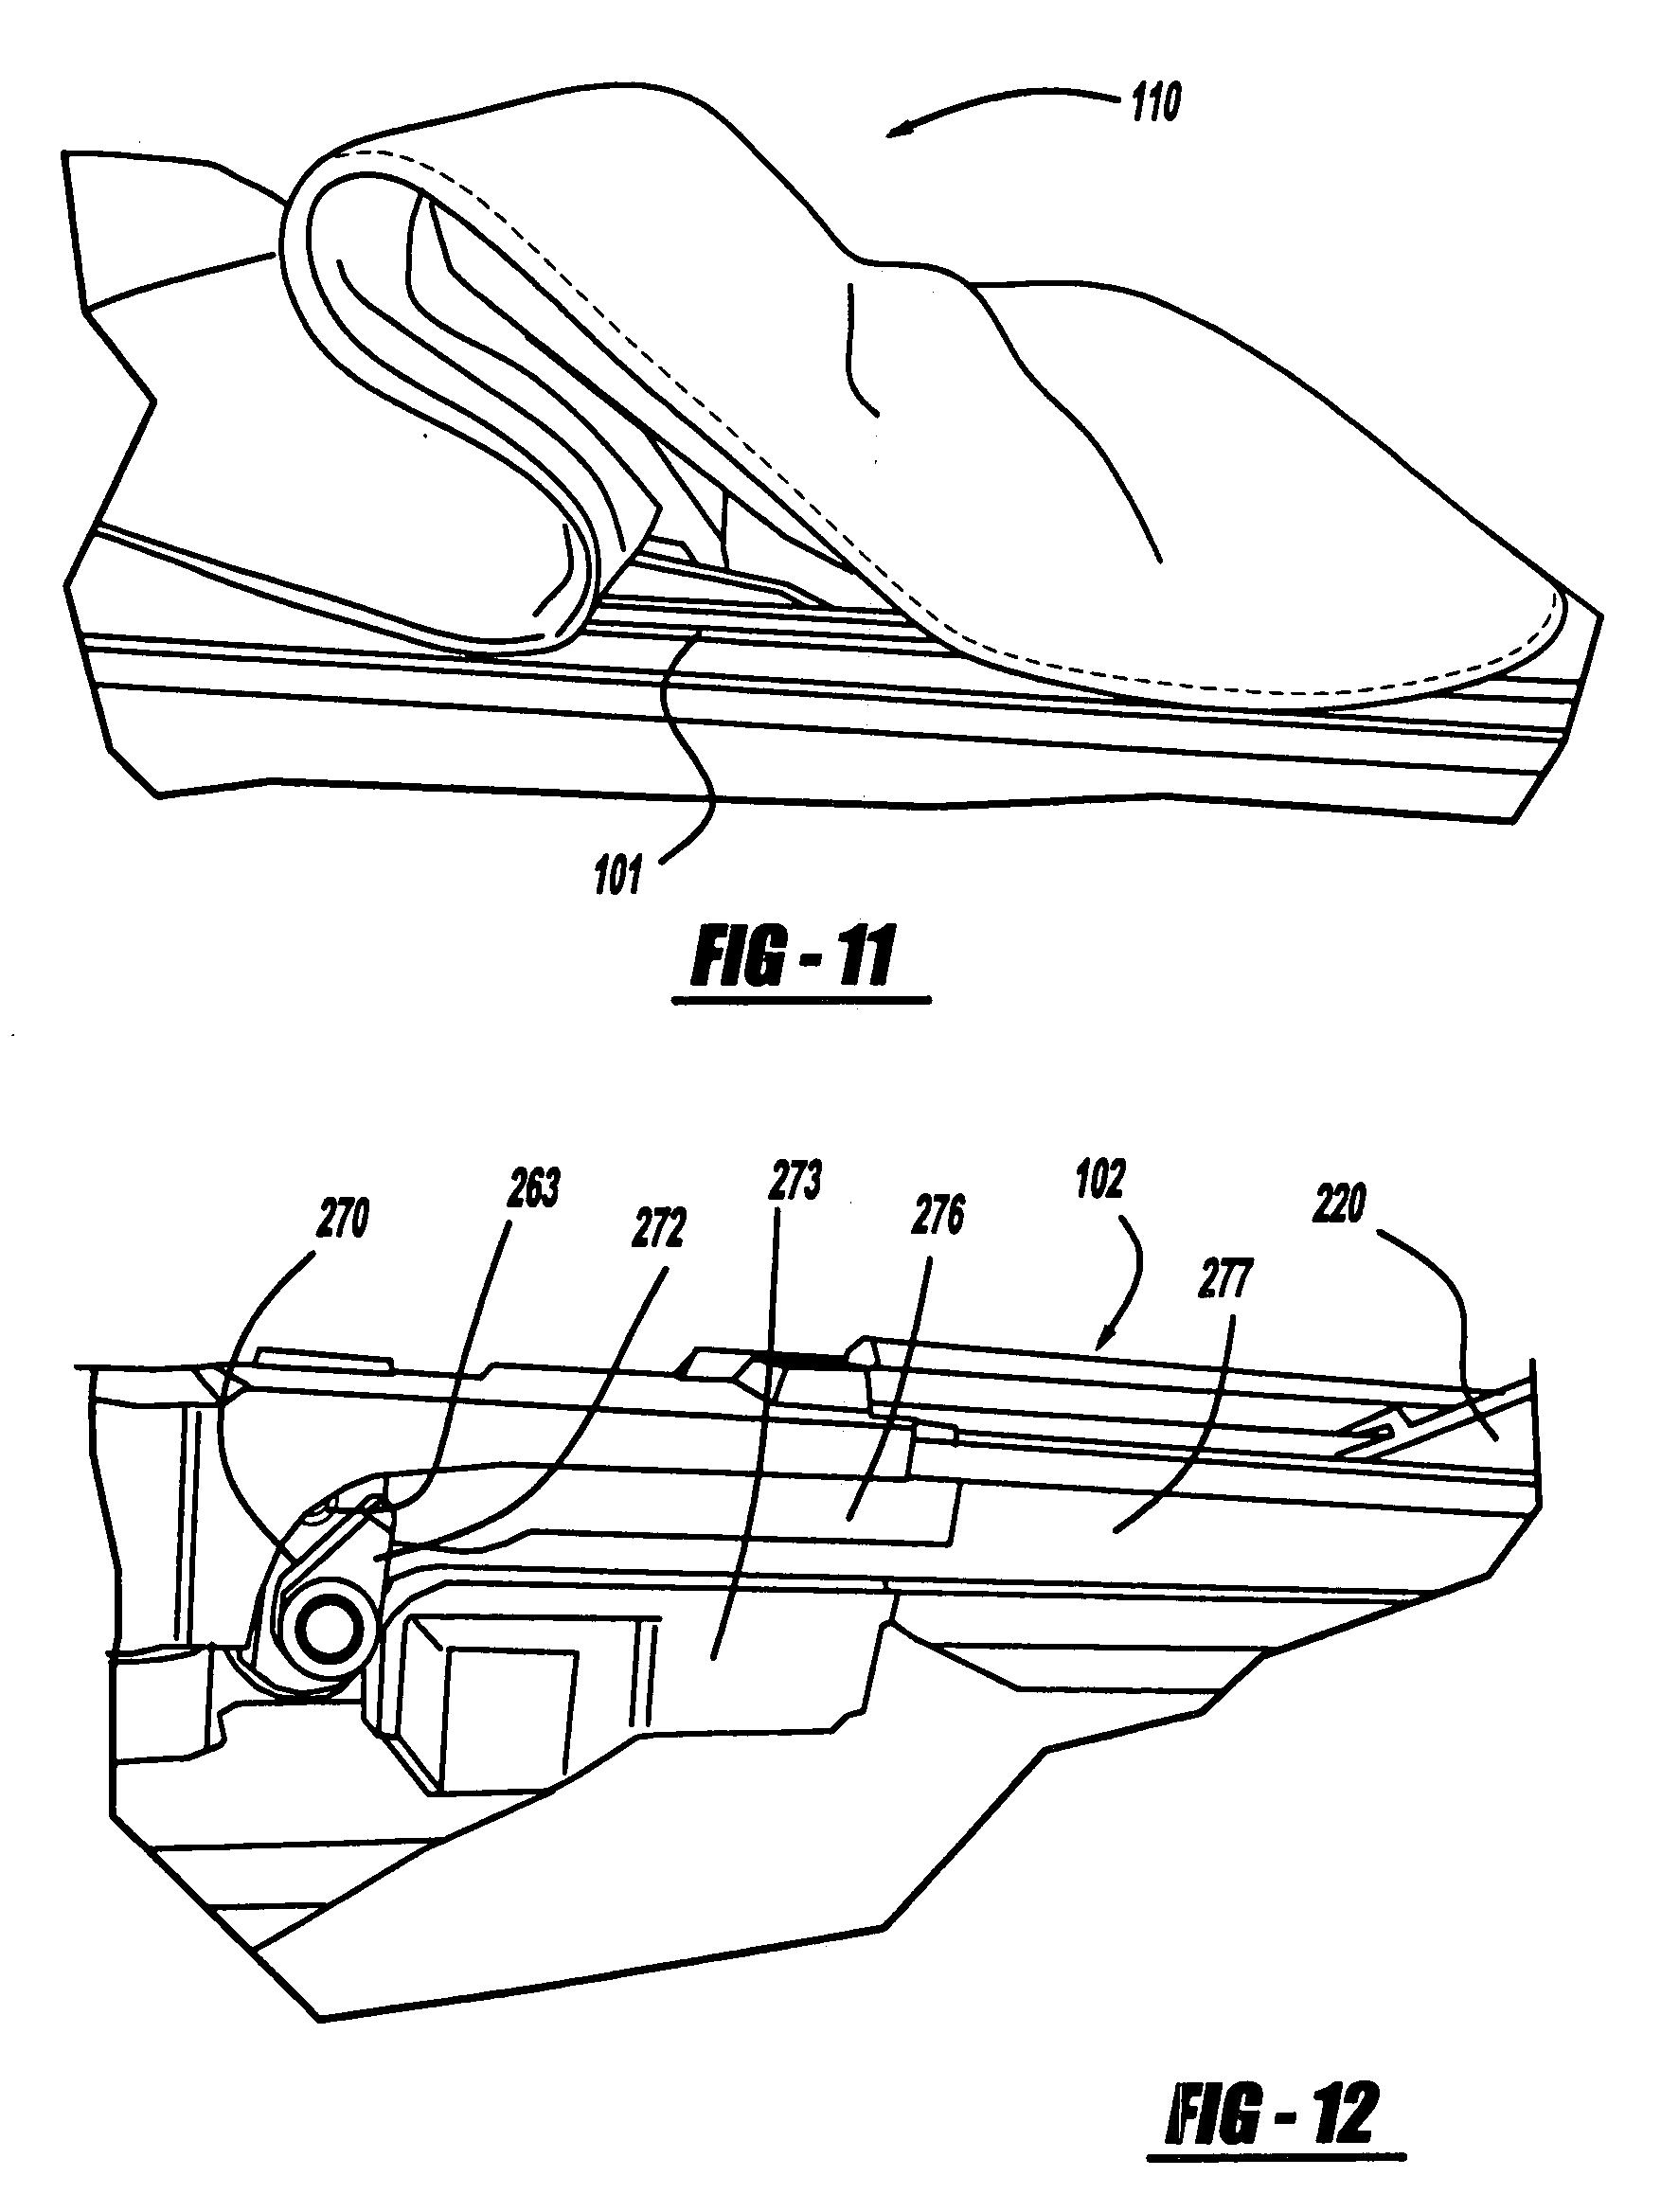 Ford Seat Belt Retractor Diagrams: Wiring Diagram 1992 Ford Ranger 3 0l At Ariaseda.org